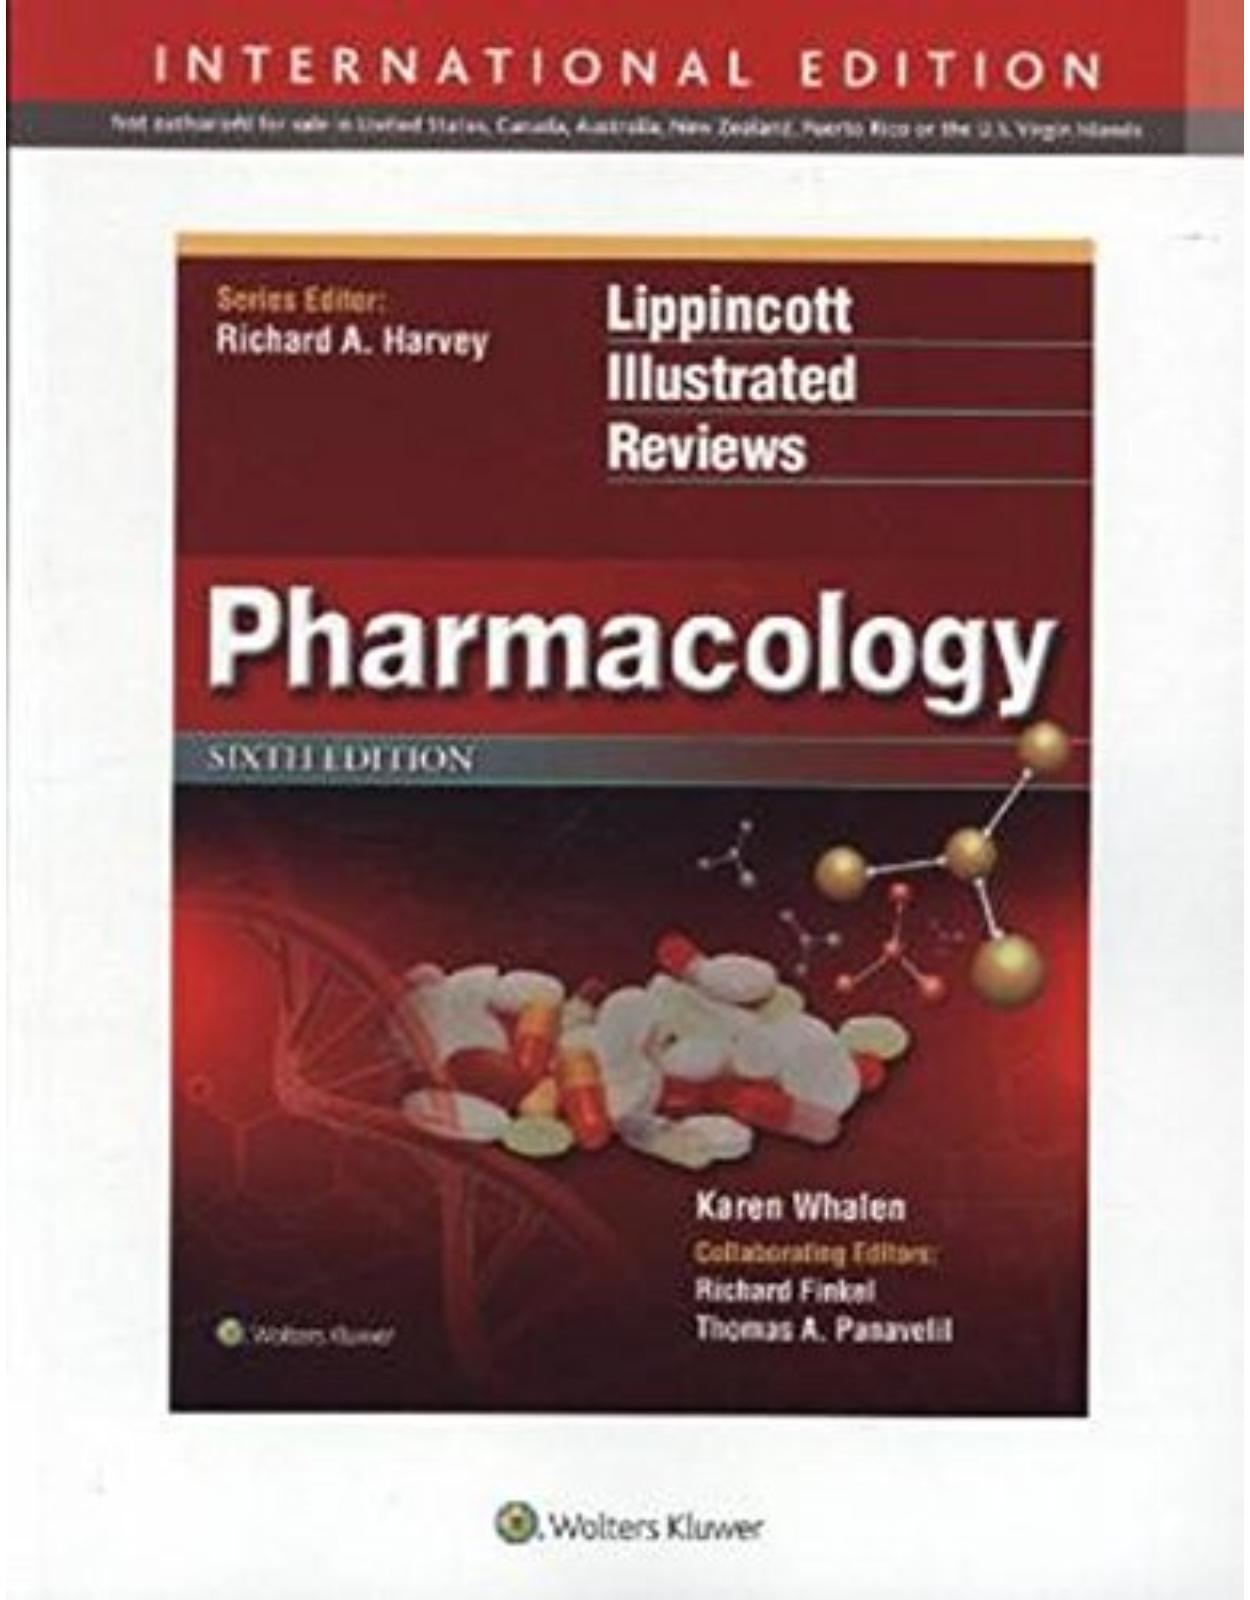 Lippincott Illustrated Reviews: Pharmacology, 6e